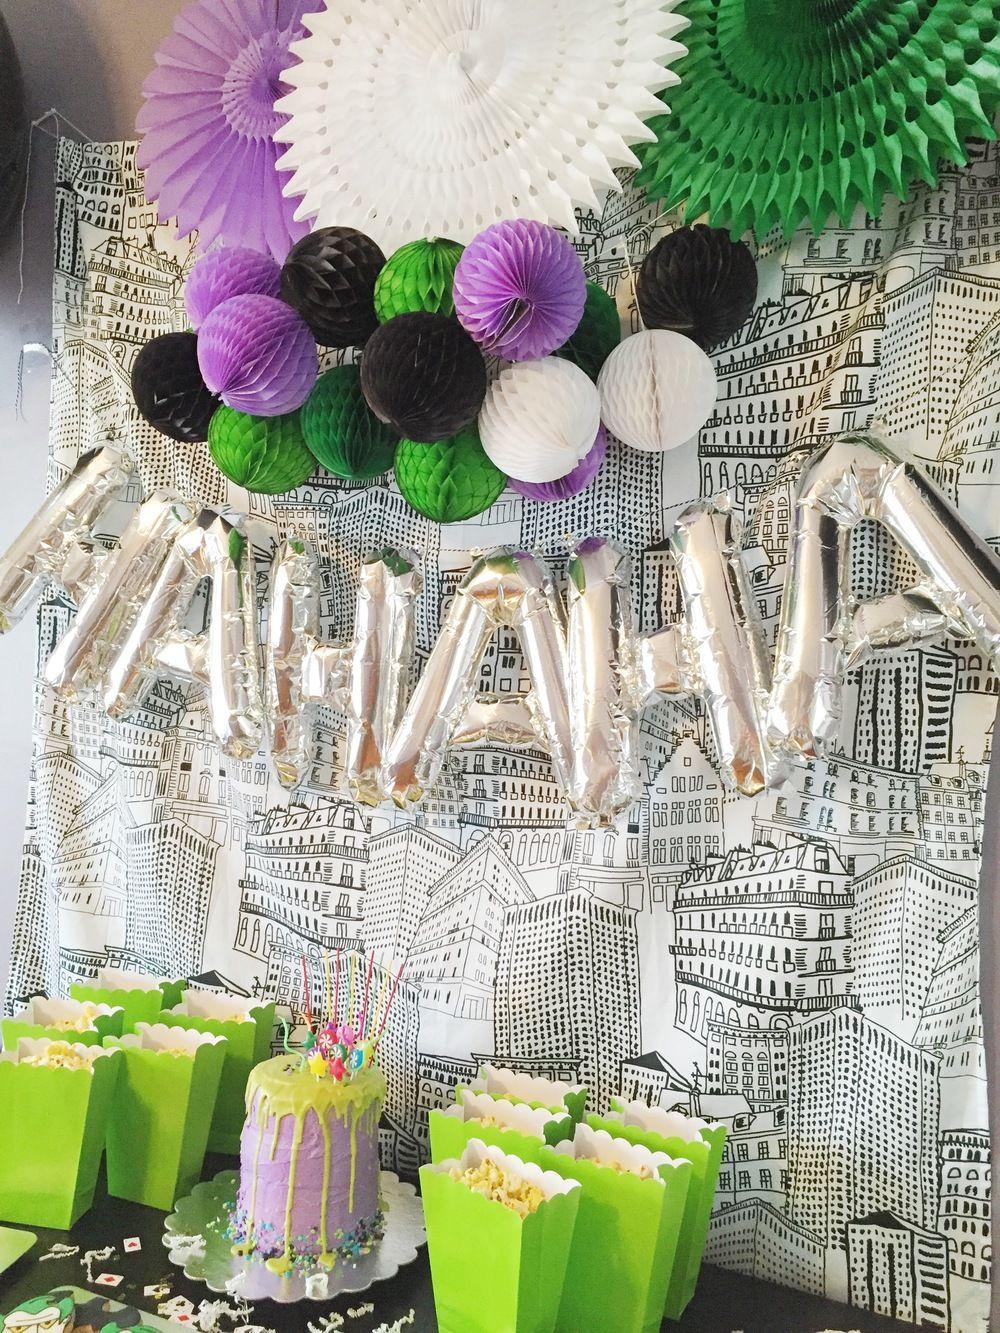 Google themes joker - Joker 3rd Birthday Party Party Ideas For Kids Modern Kids Party Ideas Happysoiree